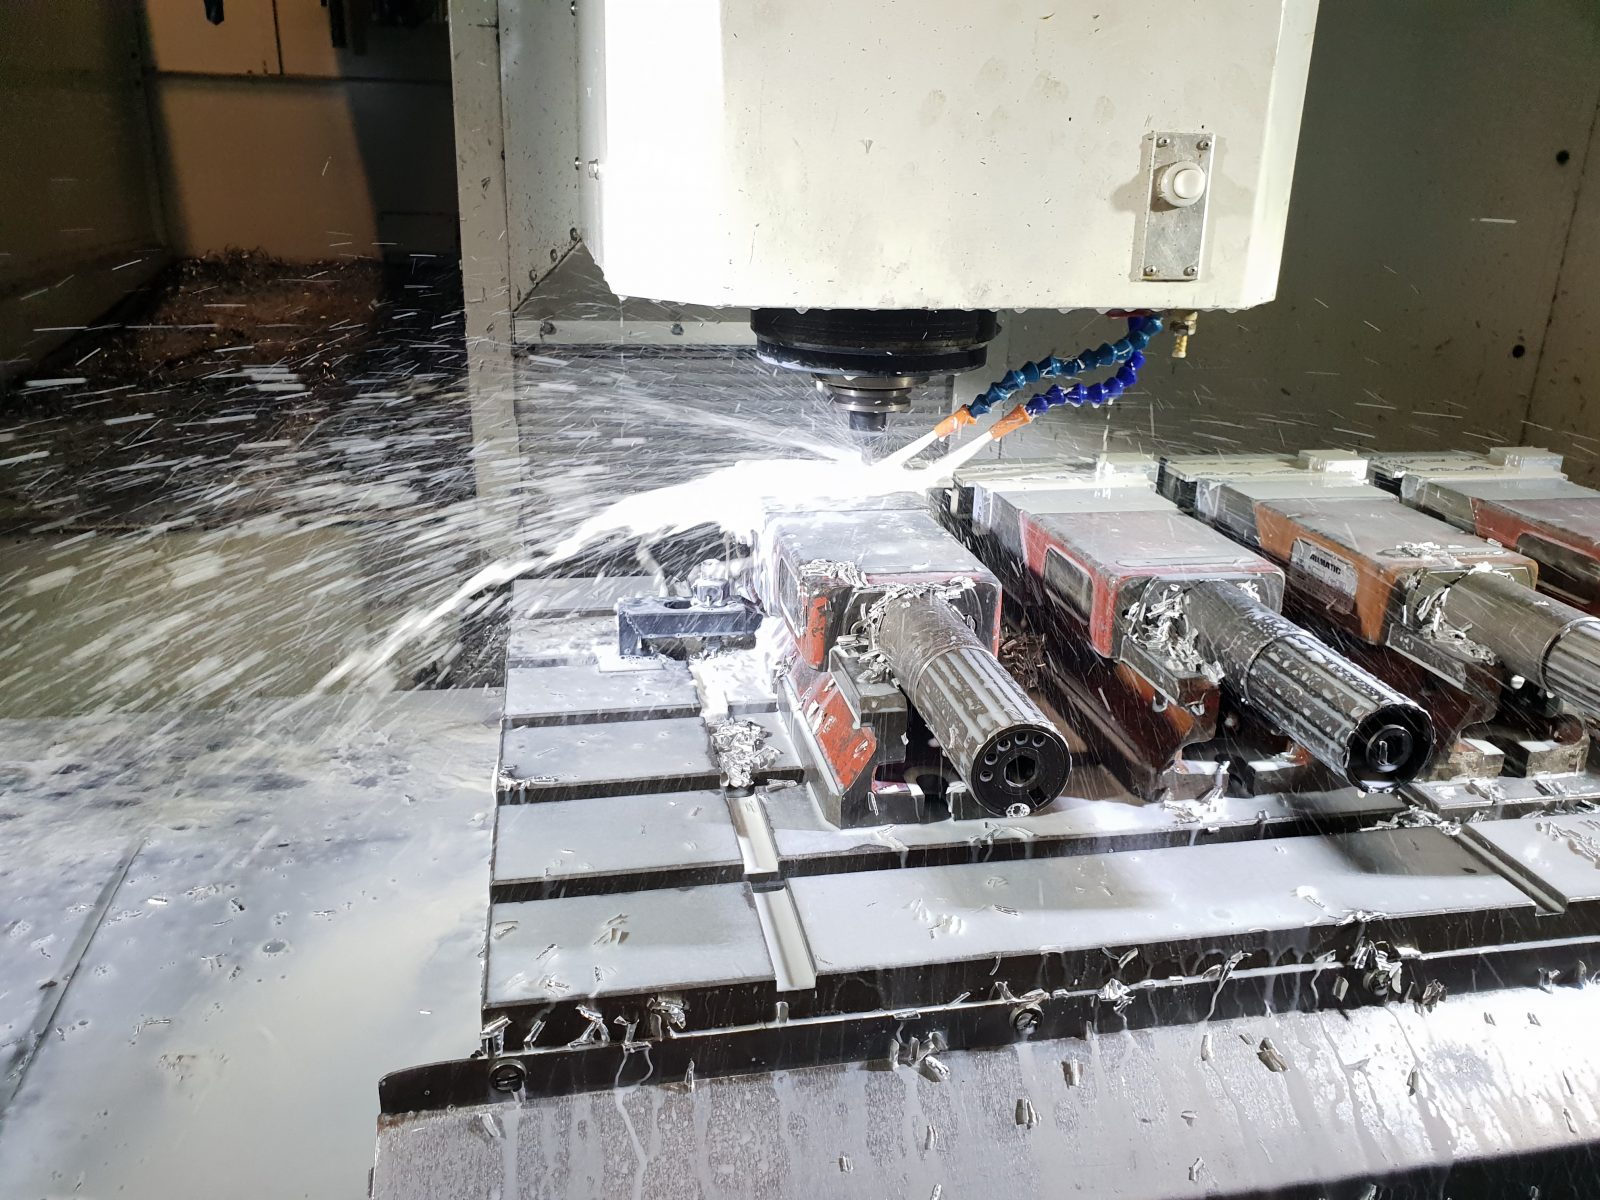 Freesmachine met led werklampen op 24V wisselspanning